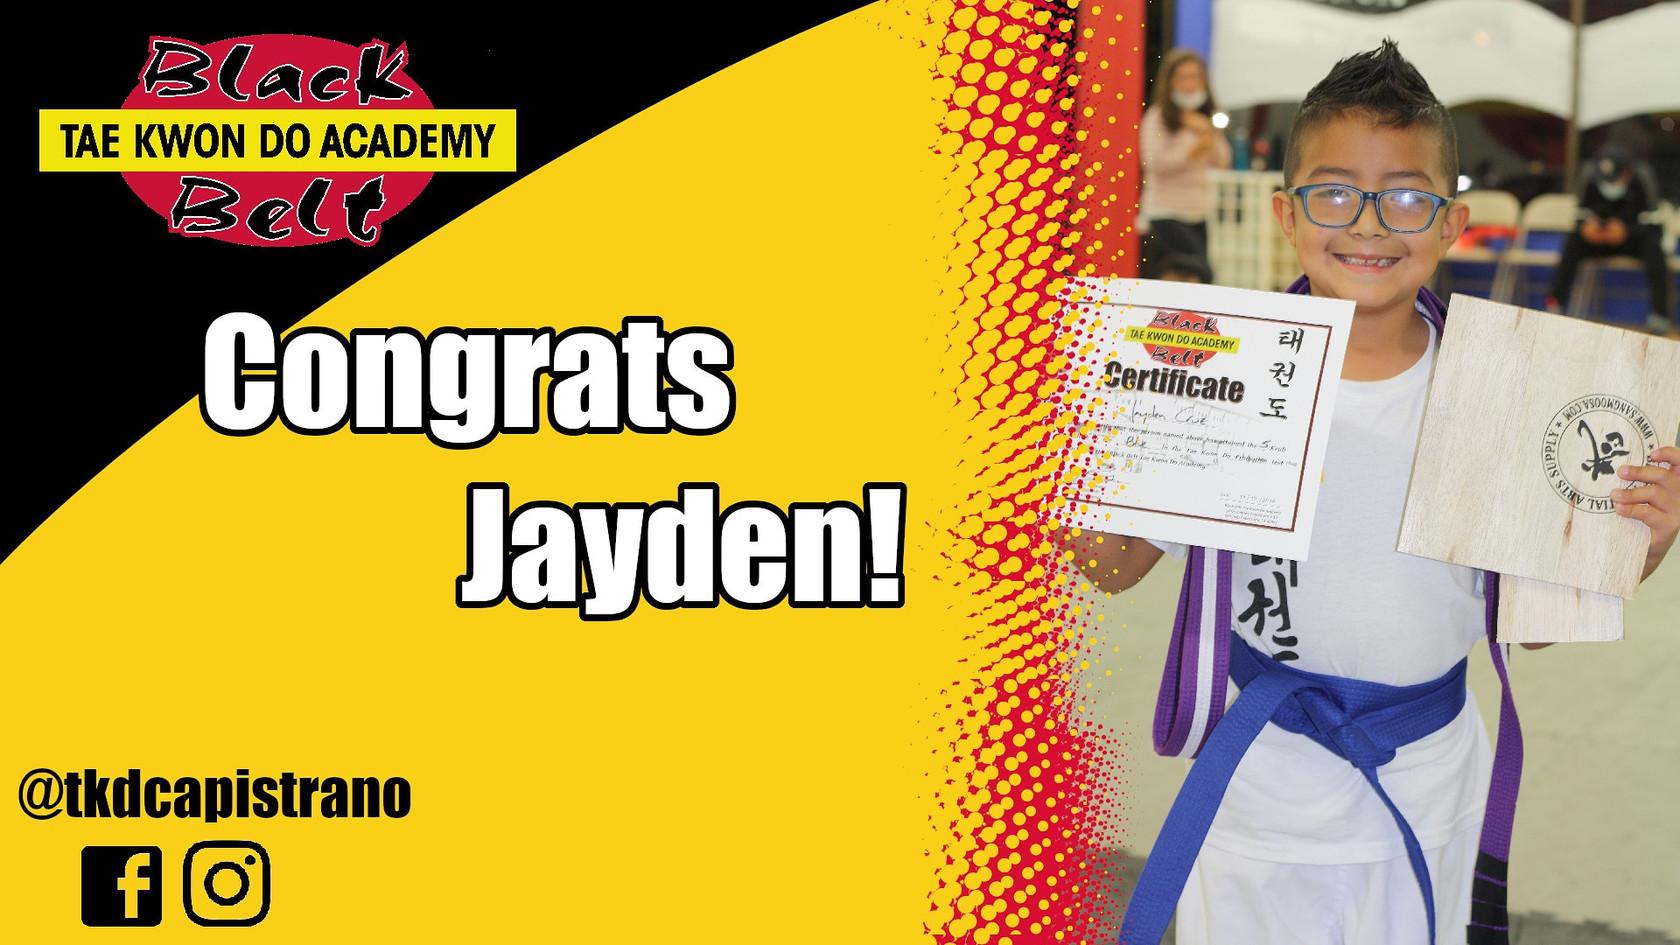 Congrats Jayden!